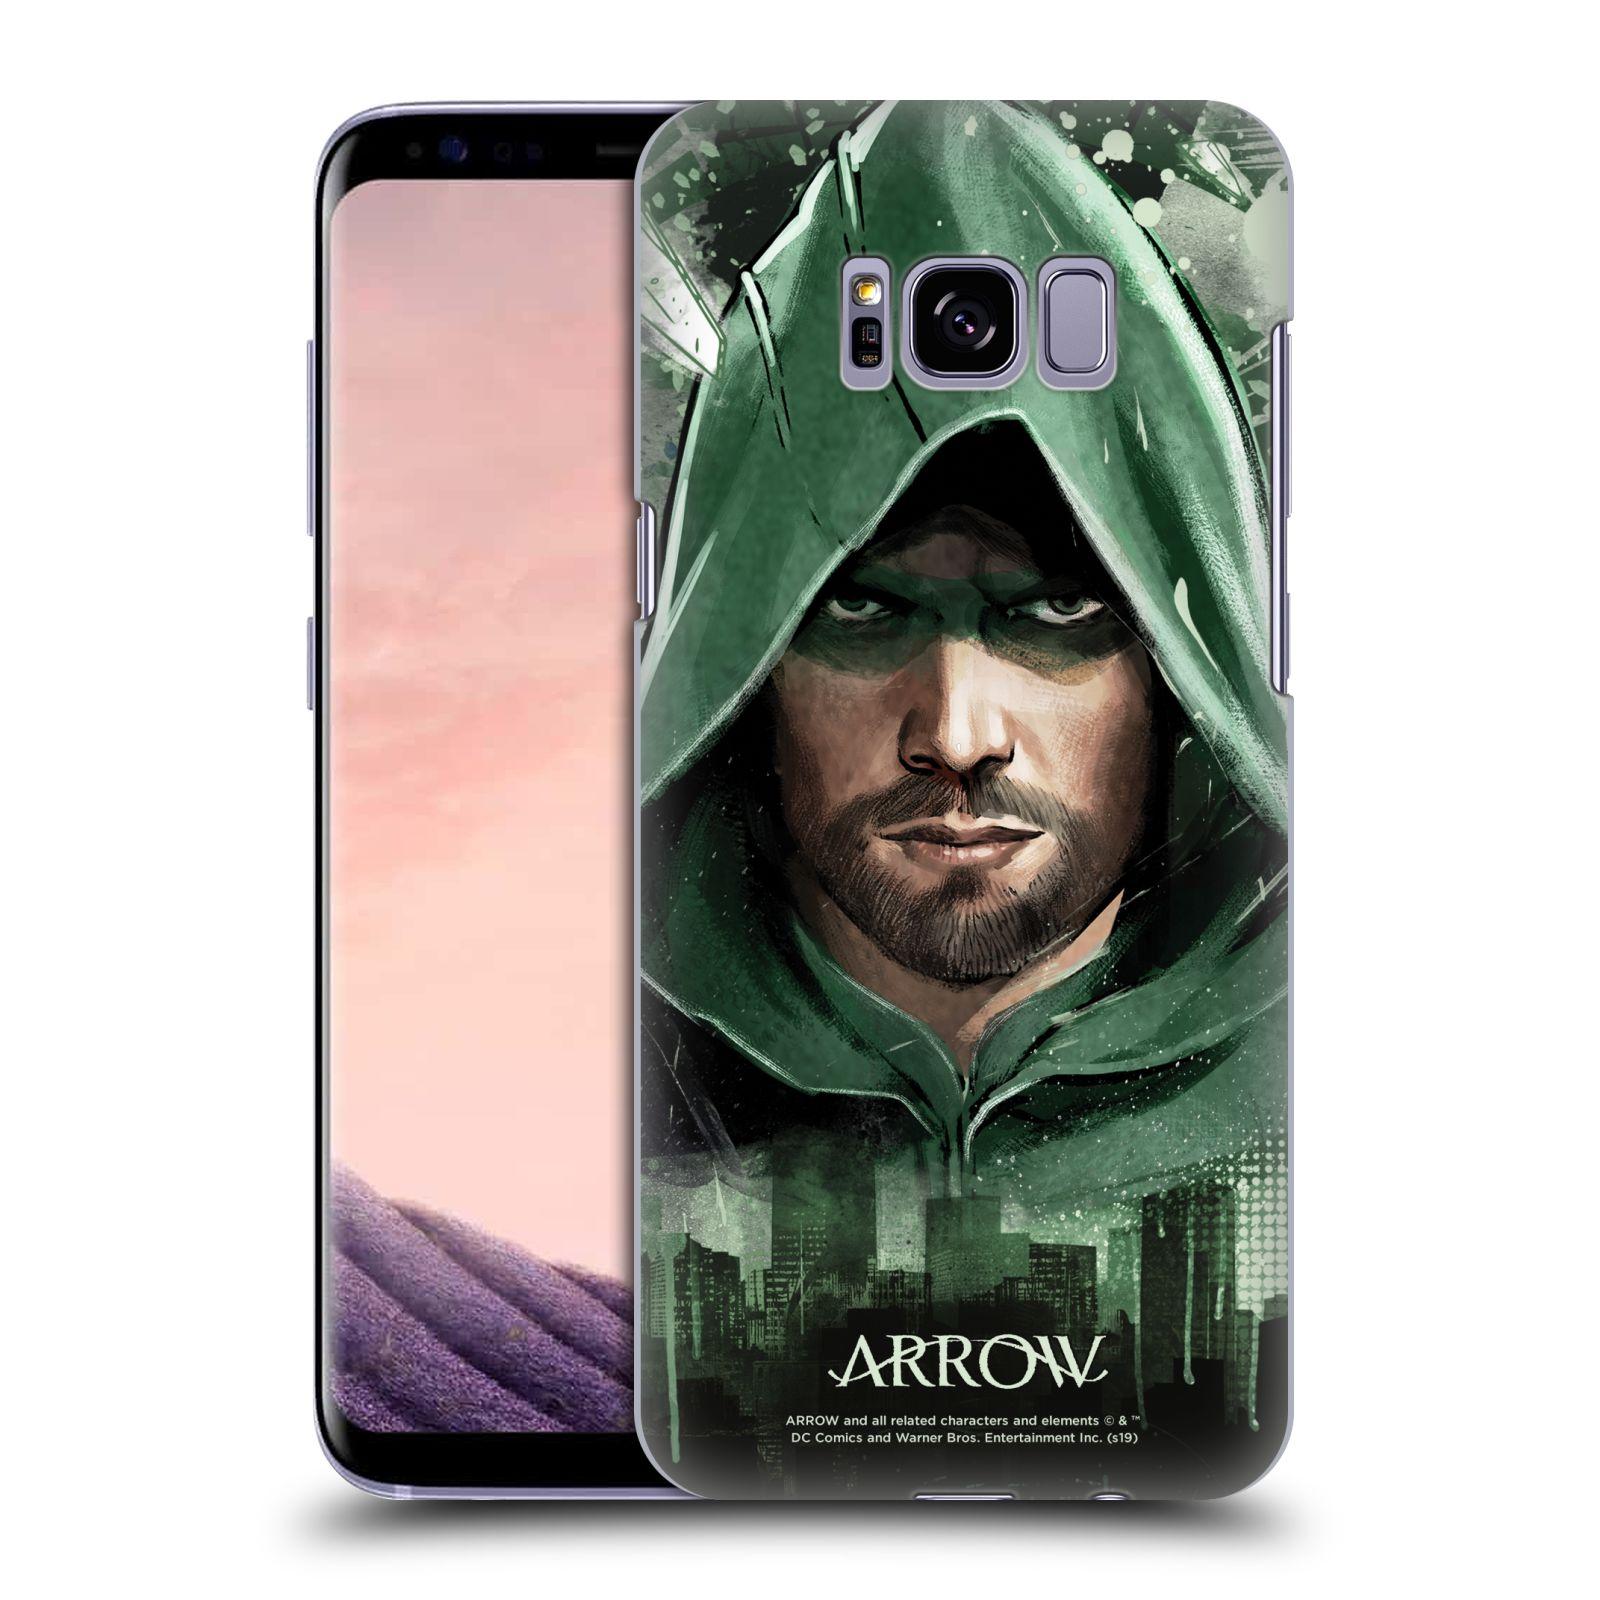 Pouzdro na mobil Samsung Galaxy S8 PLUS - HEAD CASE - Seriál Arrow - kreslený motiv